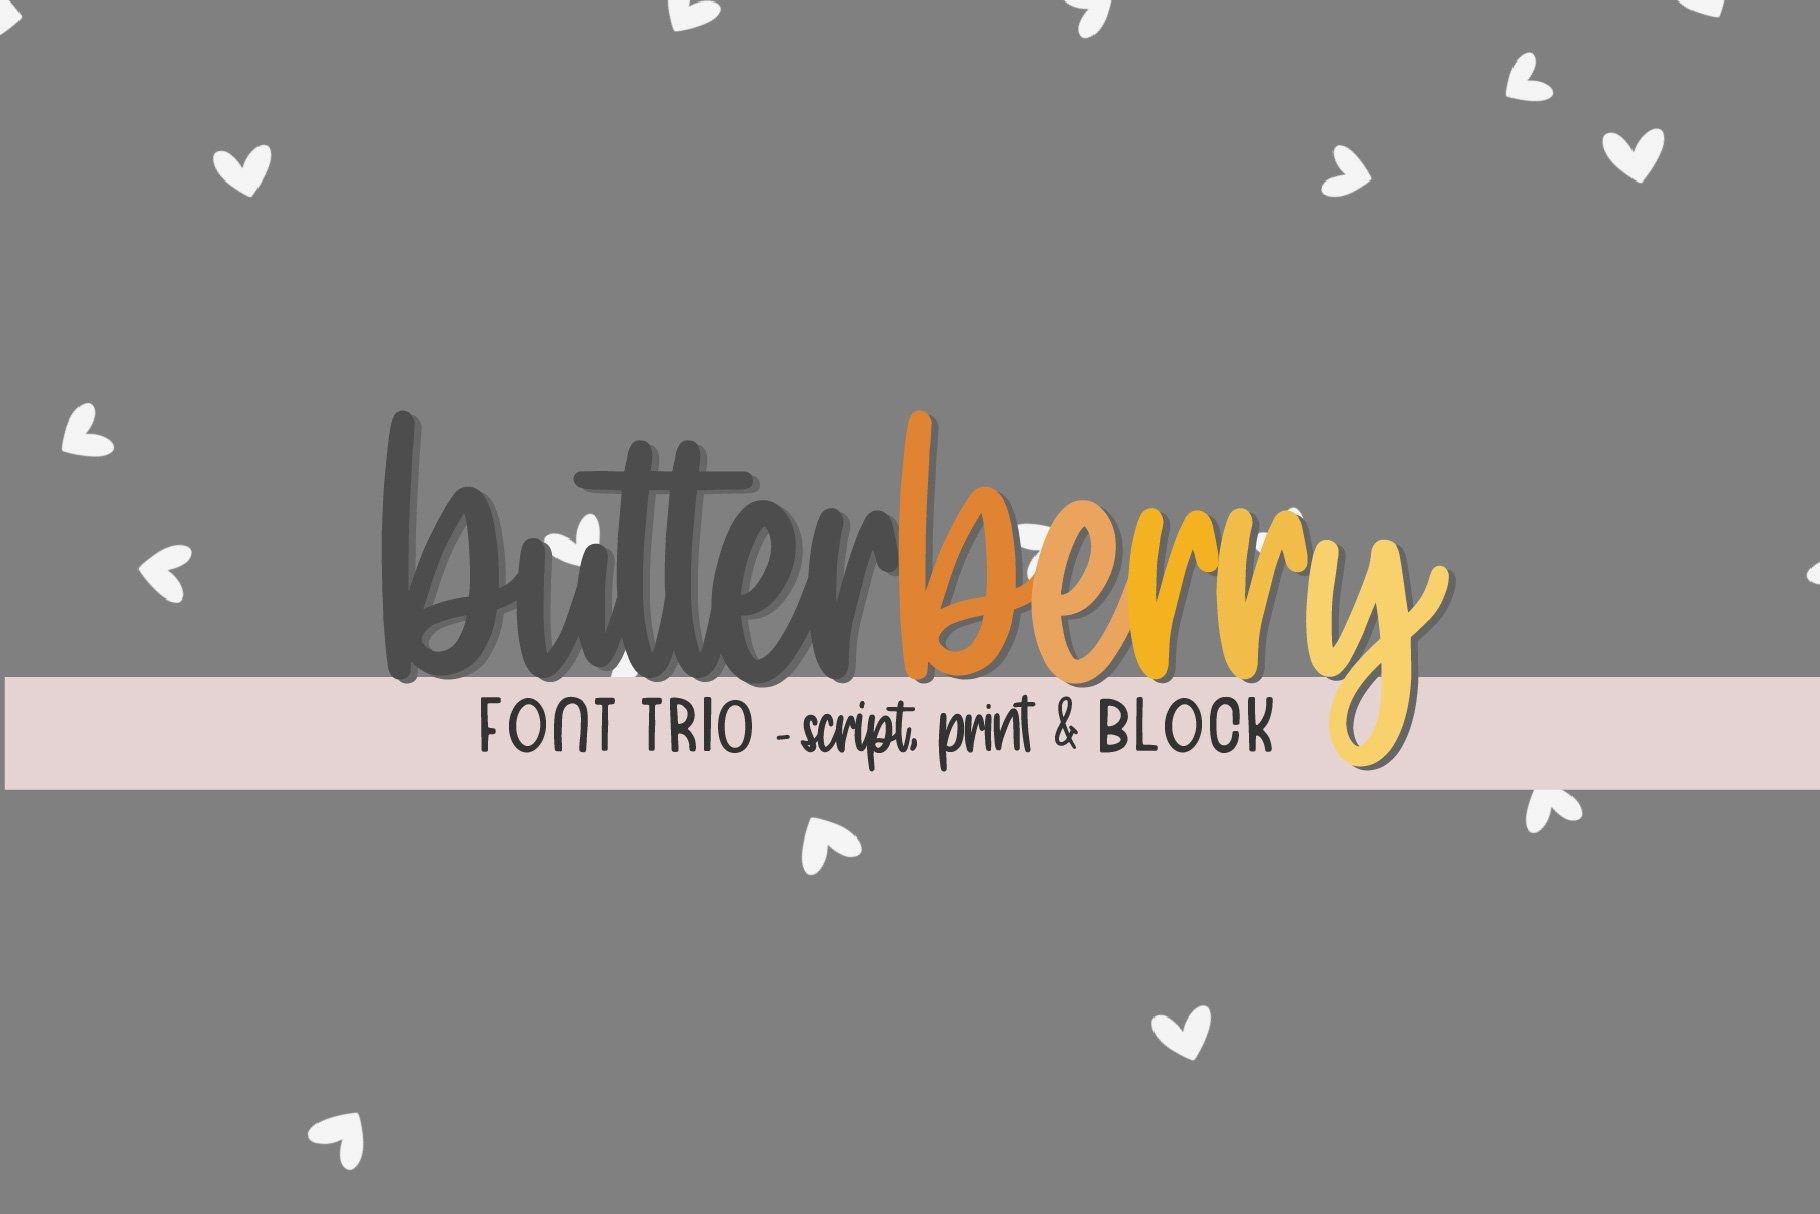 Butterberry Font Trio